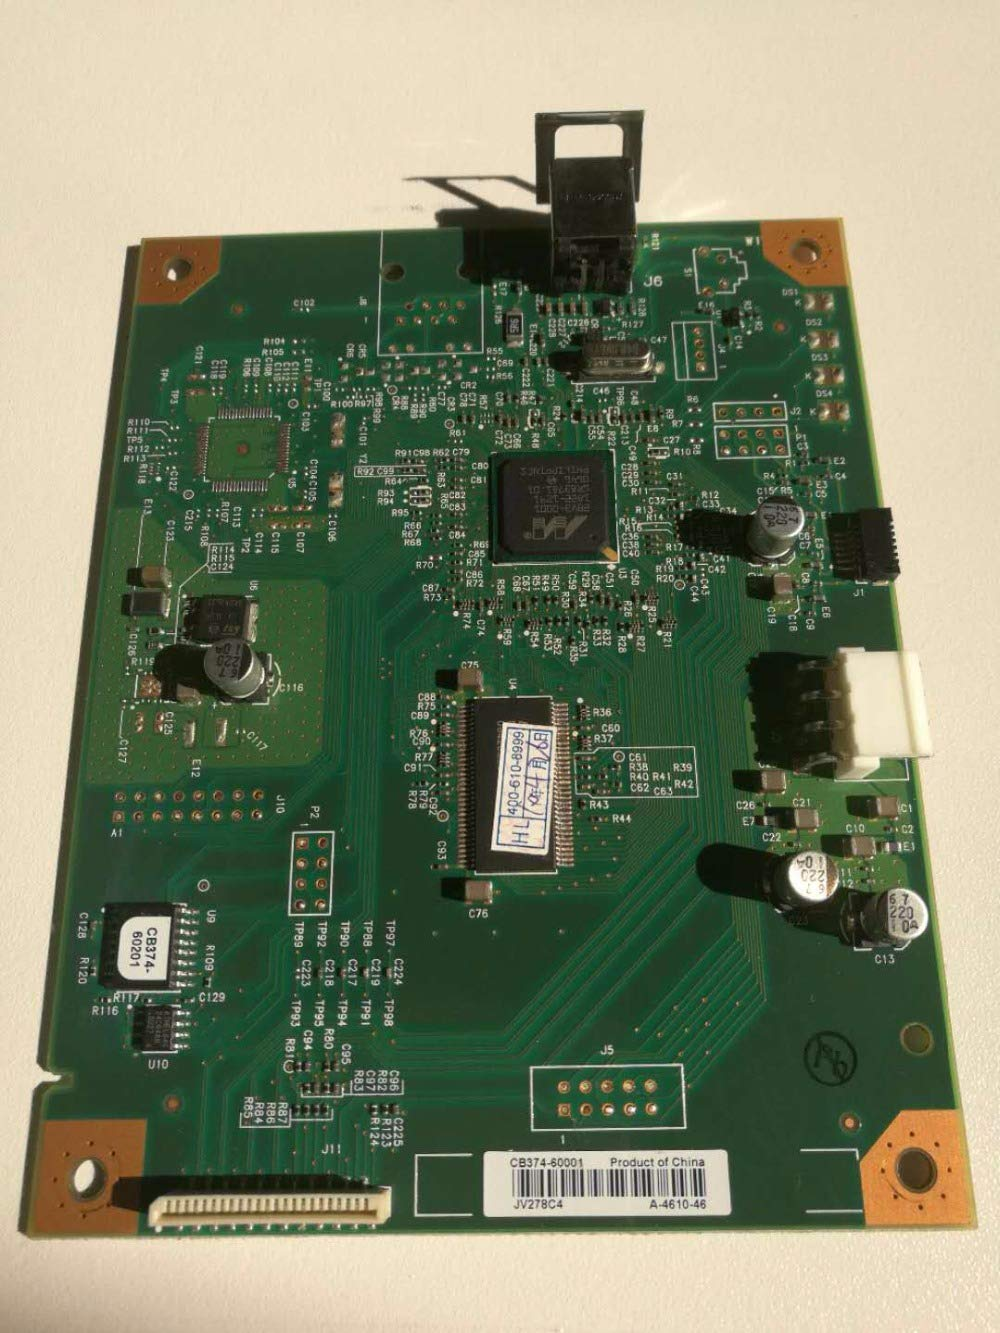 Printer Parts CB374-60001 CB374-80001 for HP Color Laserjet 1600 Yoton Board by Yoton (Image #3)